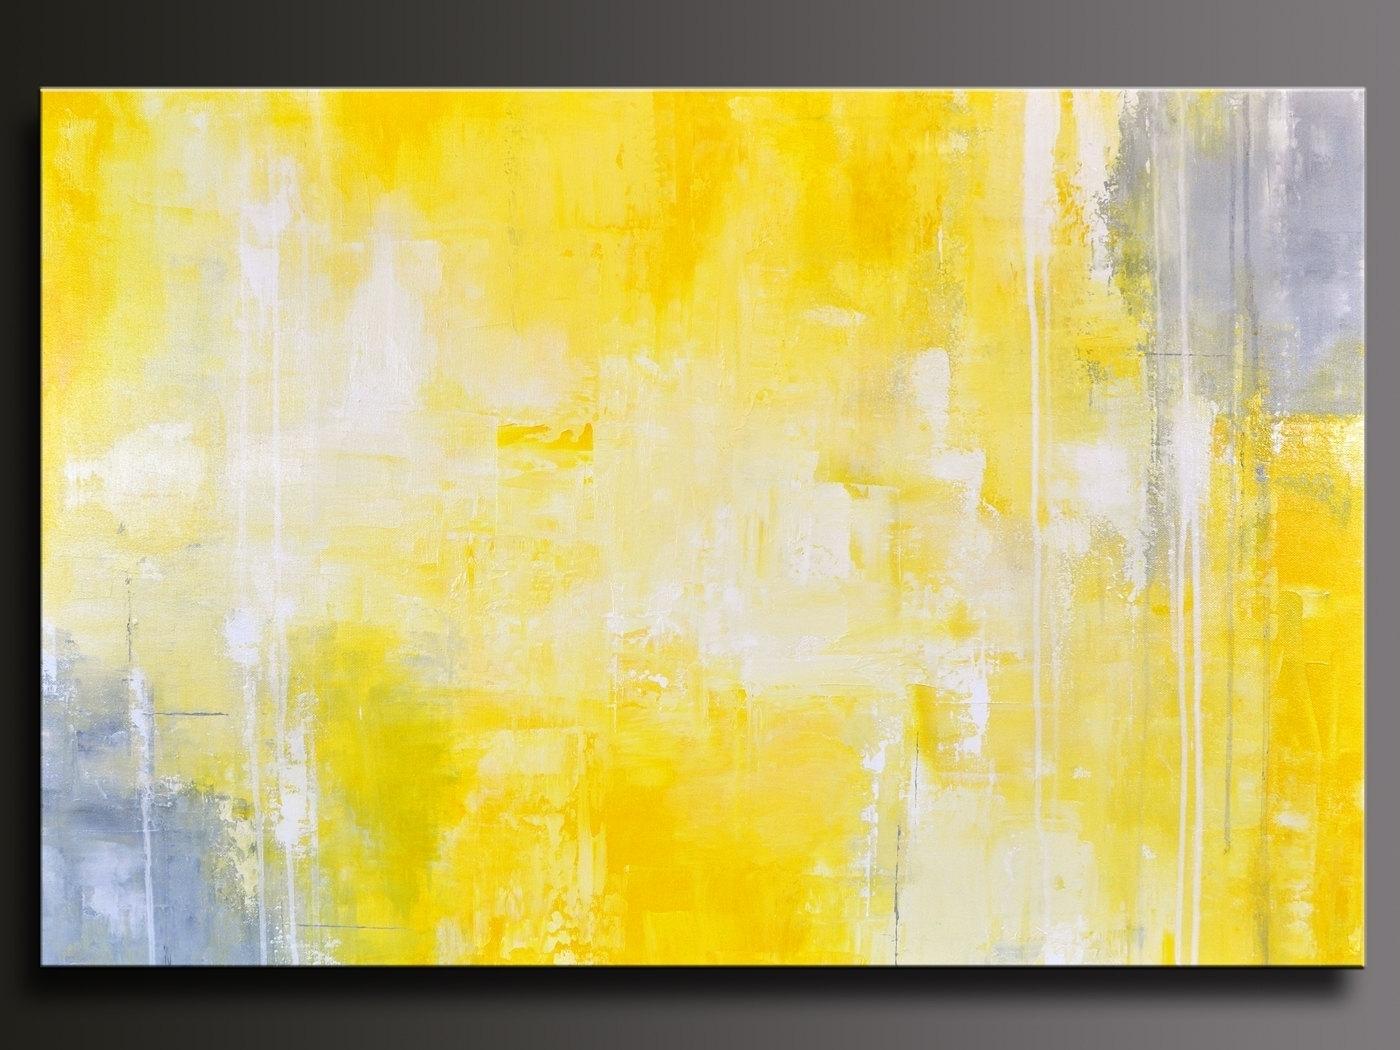 Yellow Grey Wall Art Regarding Popular Wall Art Designs Yellow And Within Yellow And Gray Wall Art (View 7 of 20)